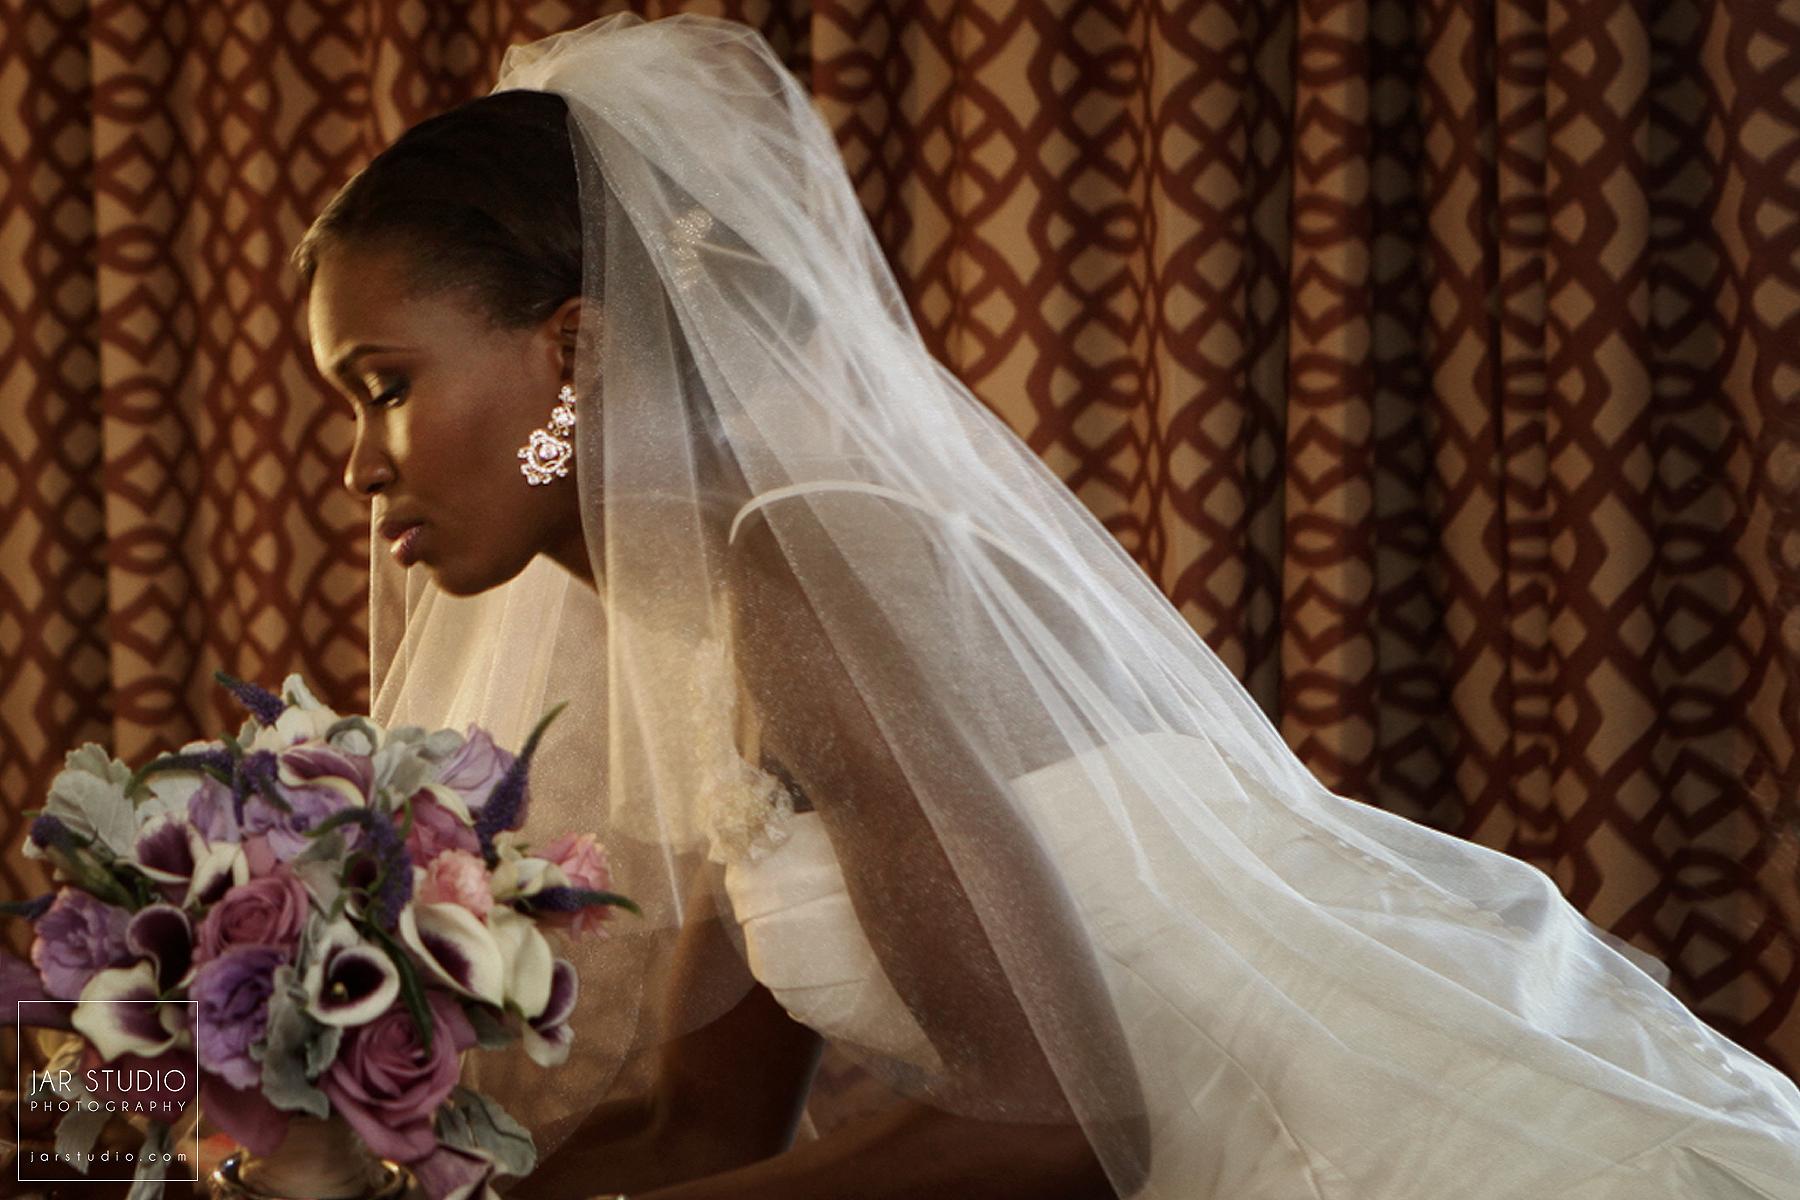 03-nigerian-bride-getting-ready-orlando-resort-disney-wedding-photographer.JPG